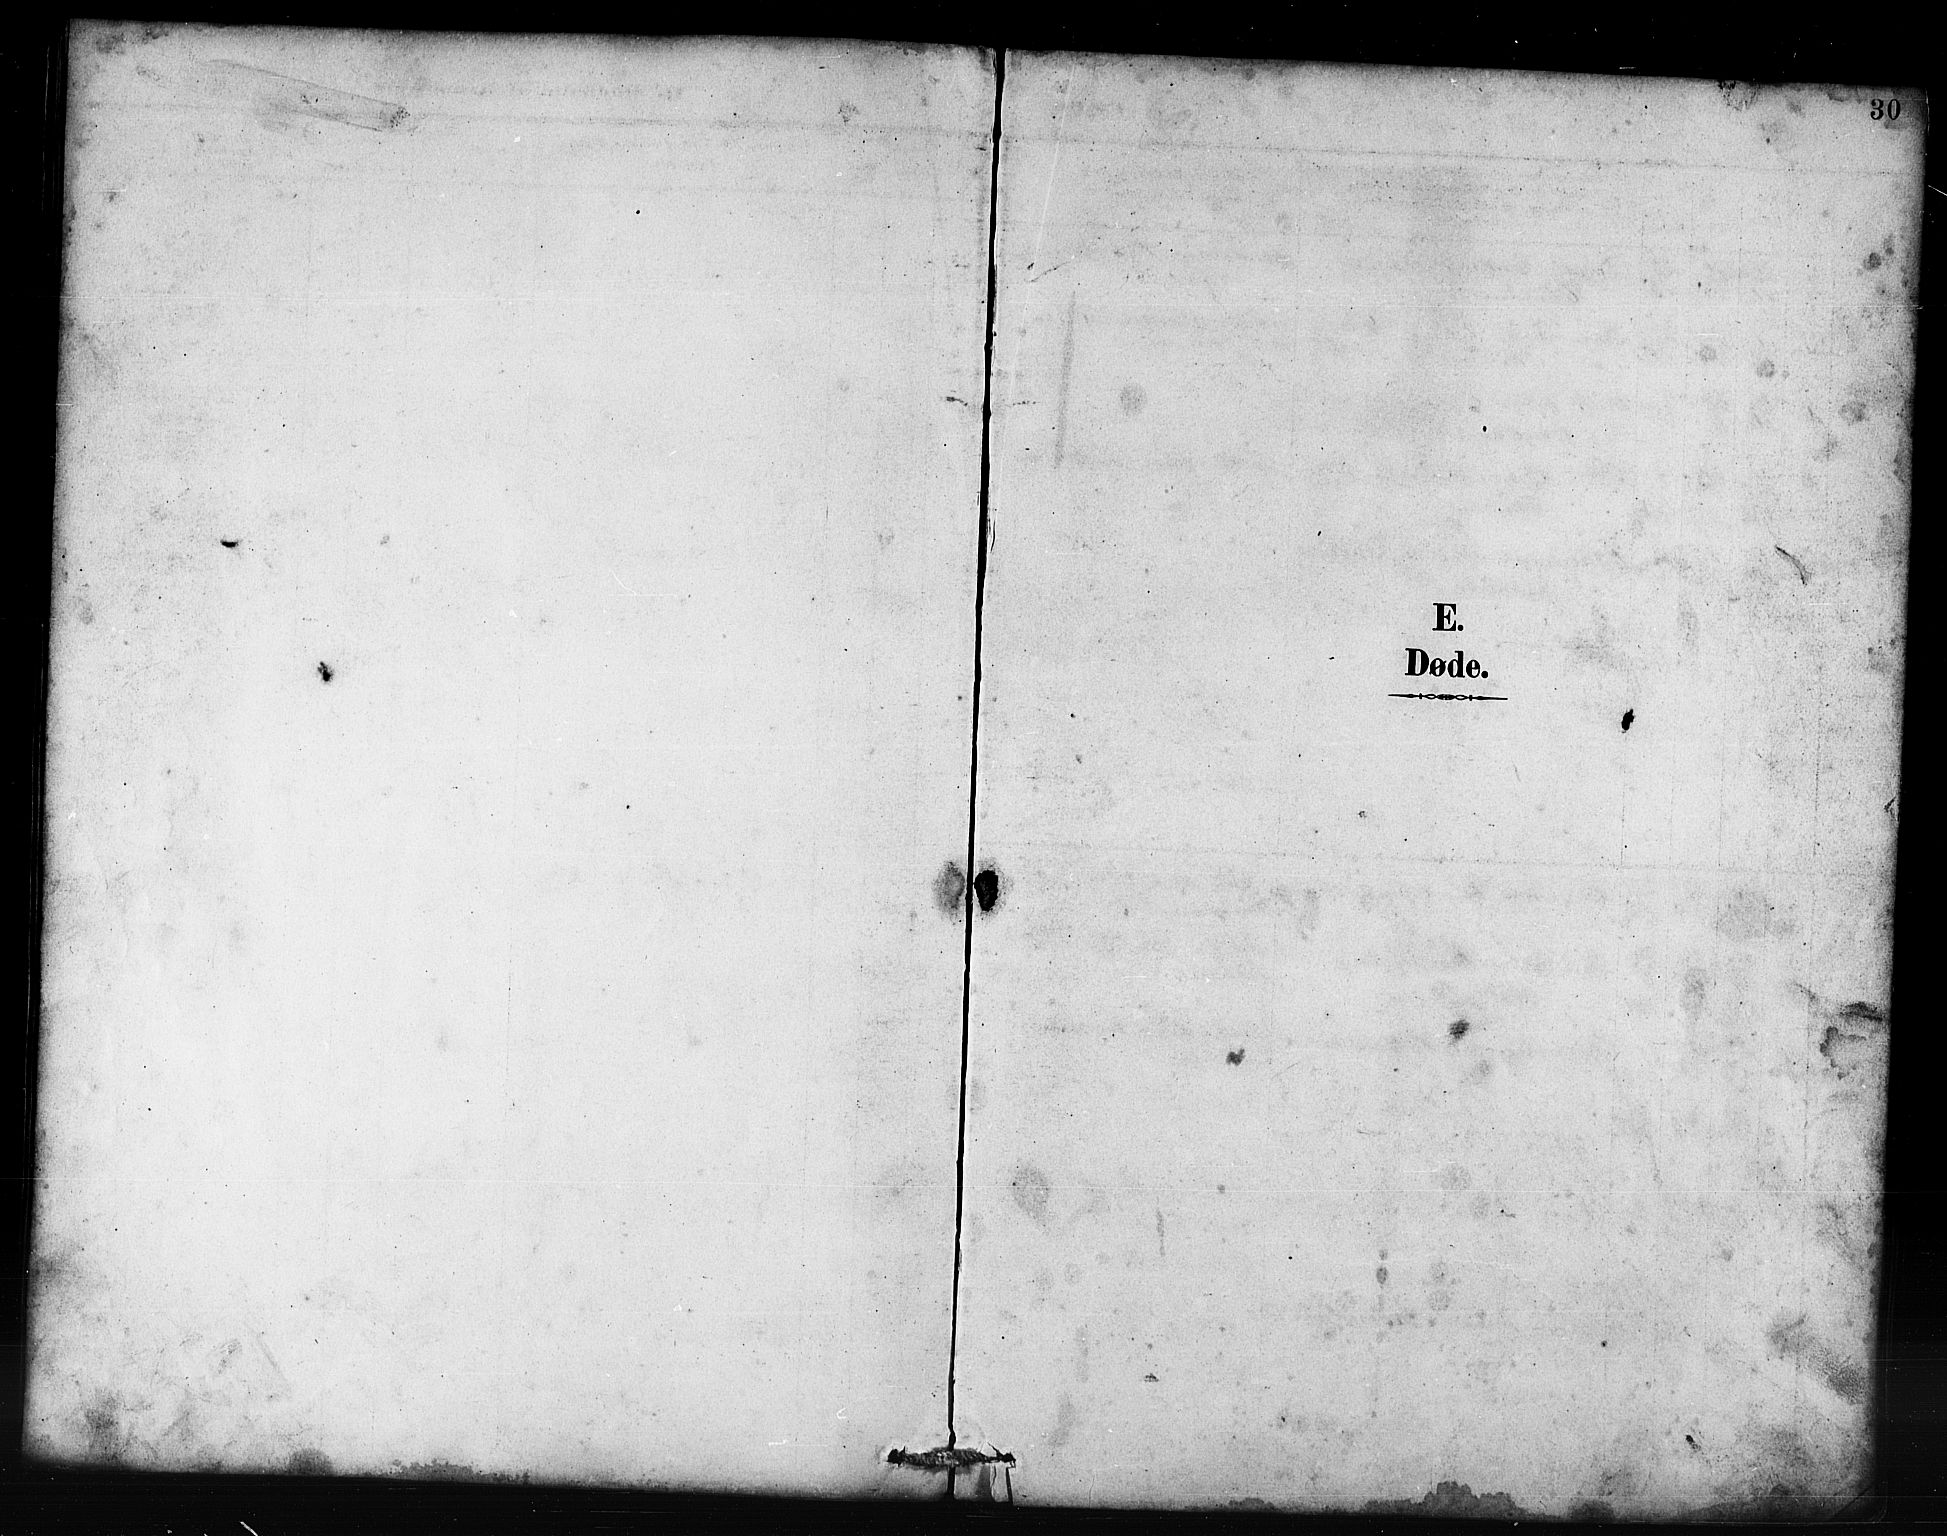 SATØ, Kjelvik/Nordkapp sokneprestkontor, J/Ja/L0027: Annen kirkebok nr. 27, 1887-1918, s. 30